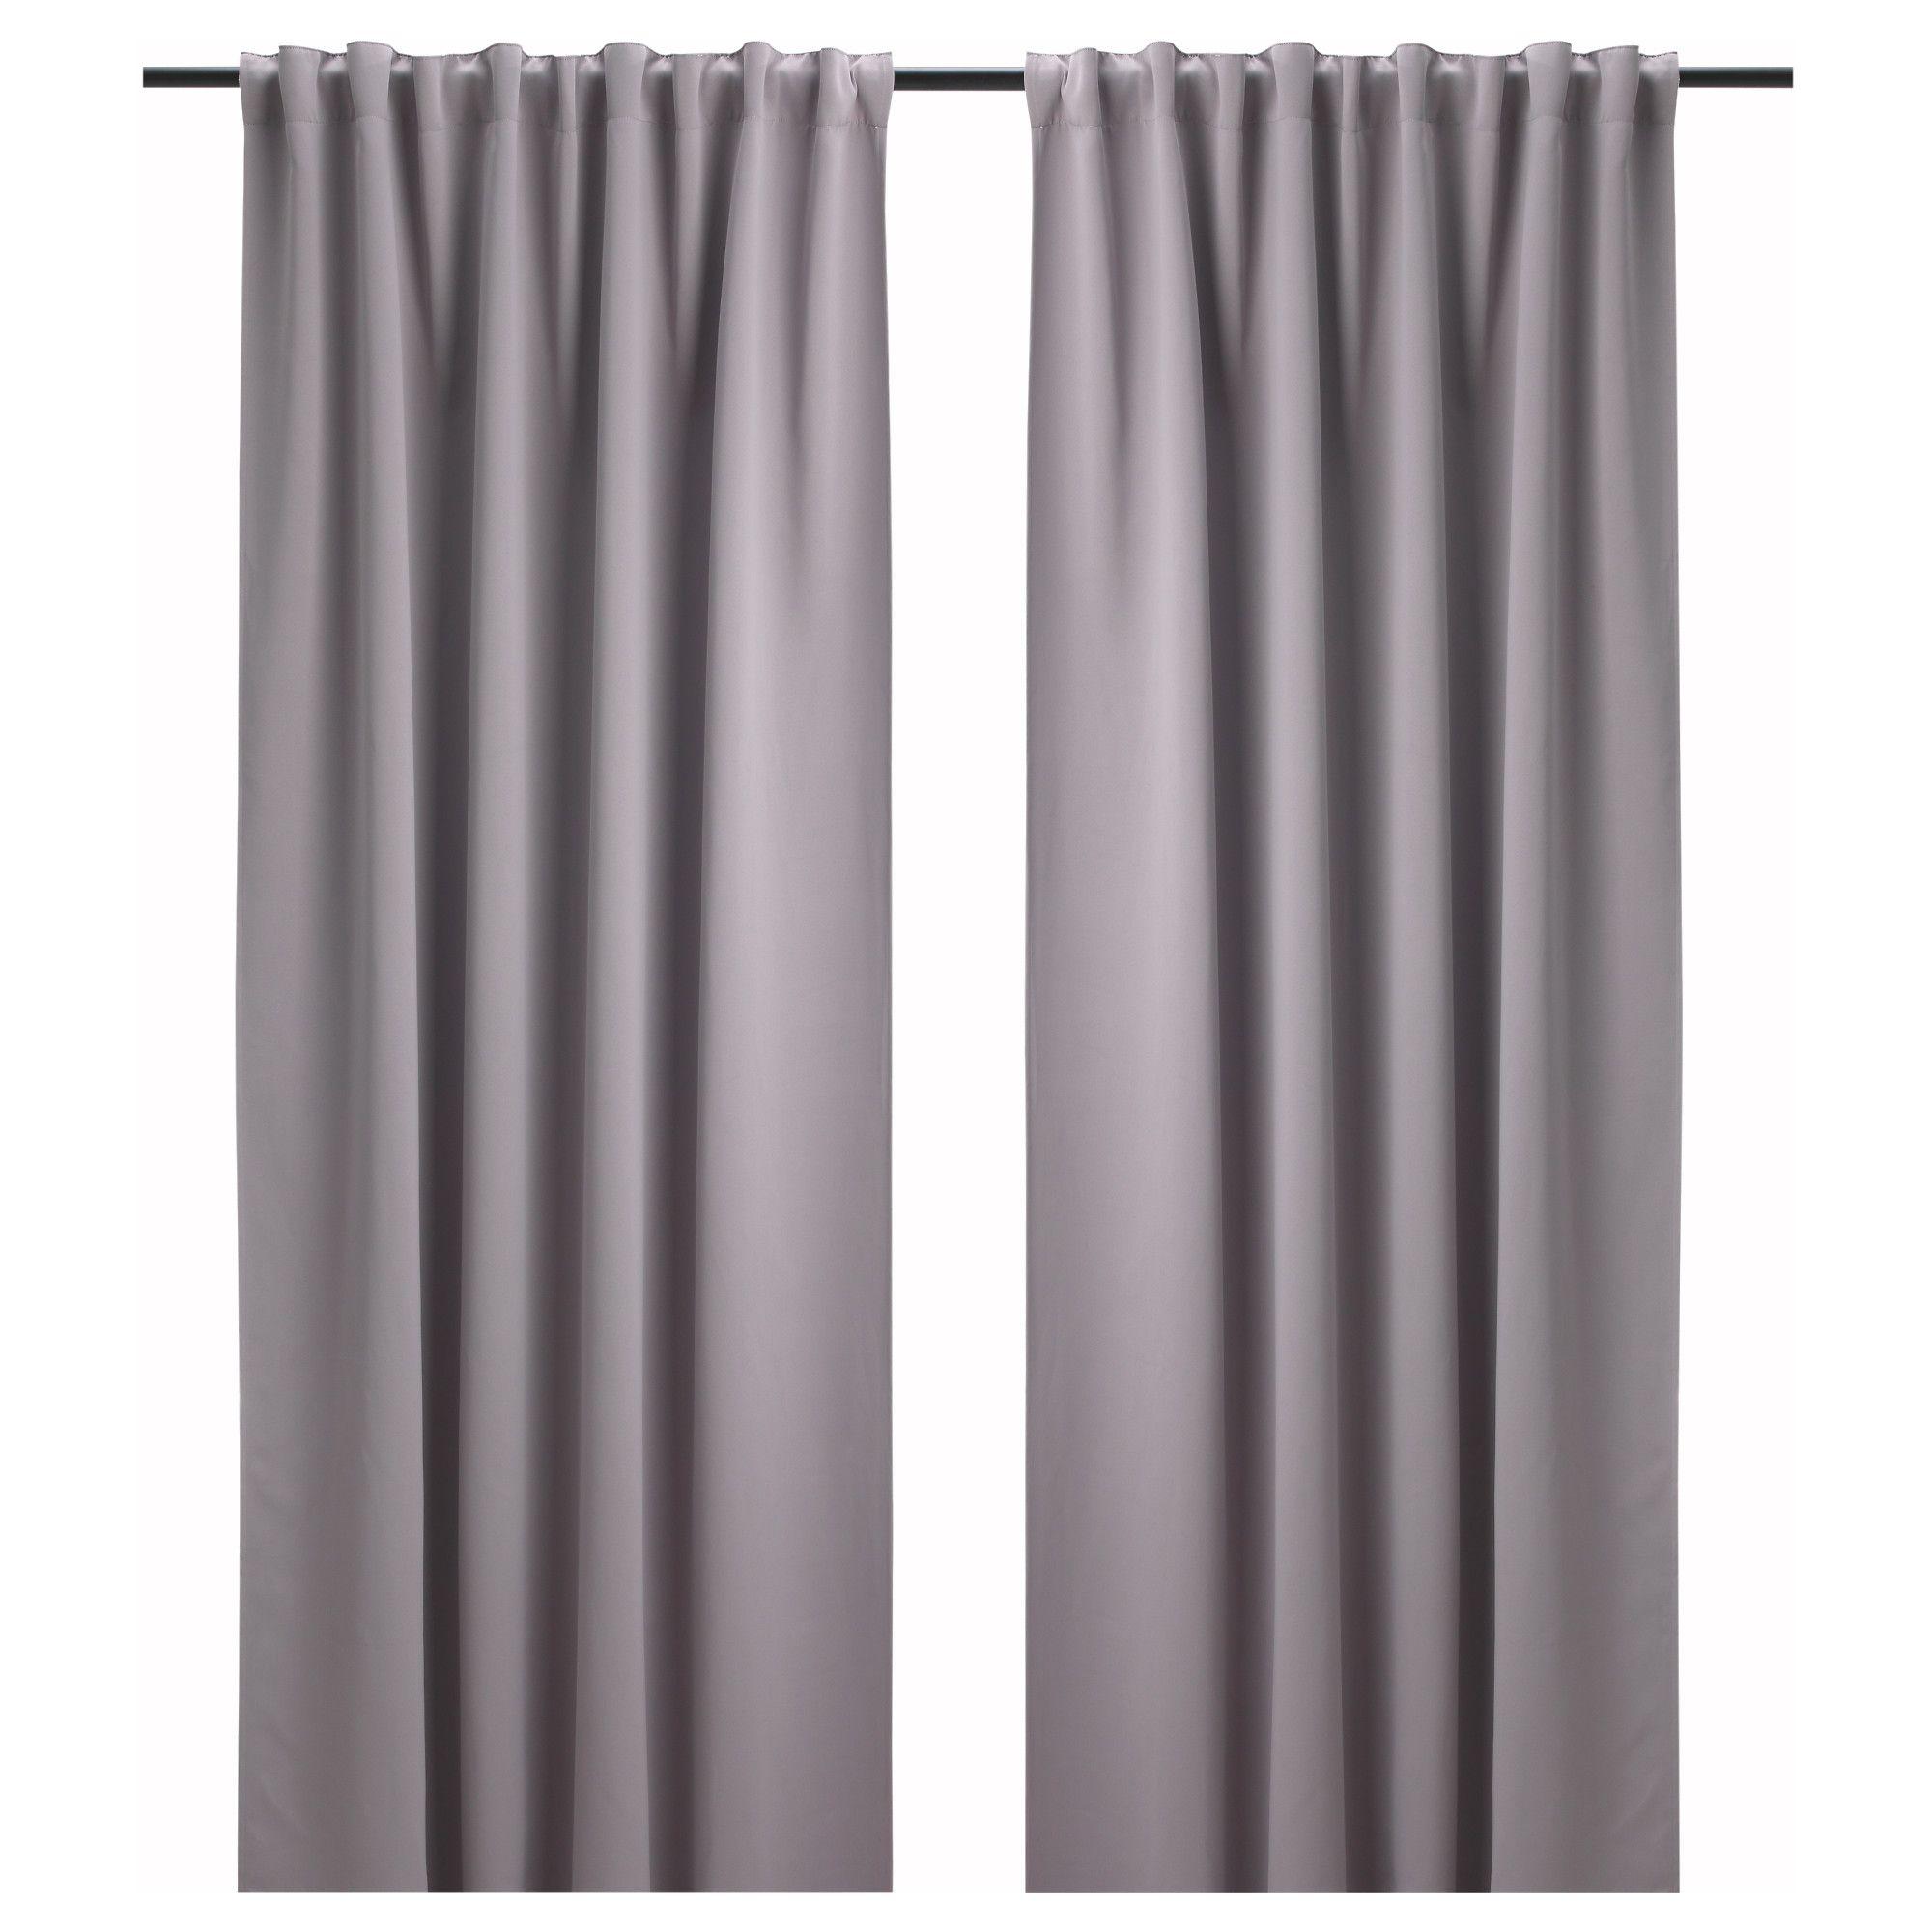 IKEA BOLLOLVON block-out curtains, 1 pair | Home | Pinterest ...